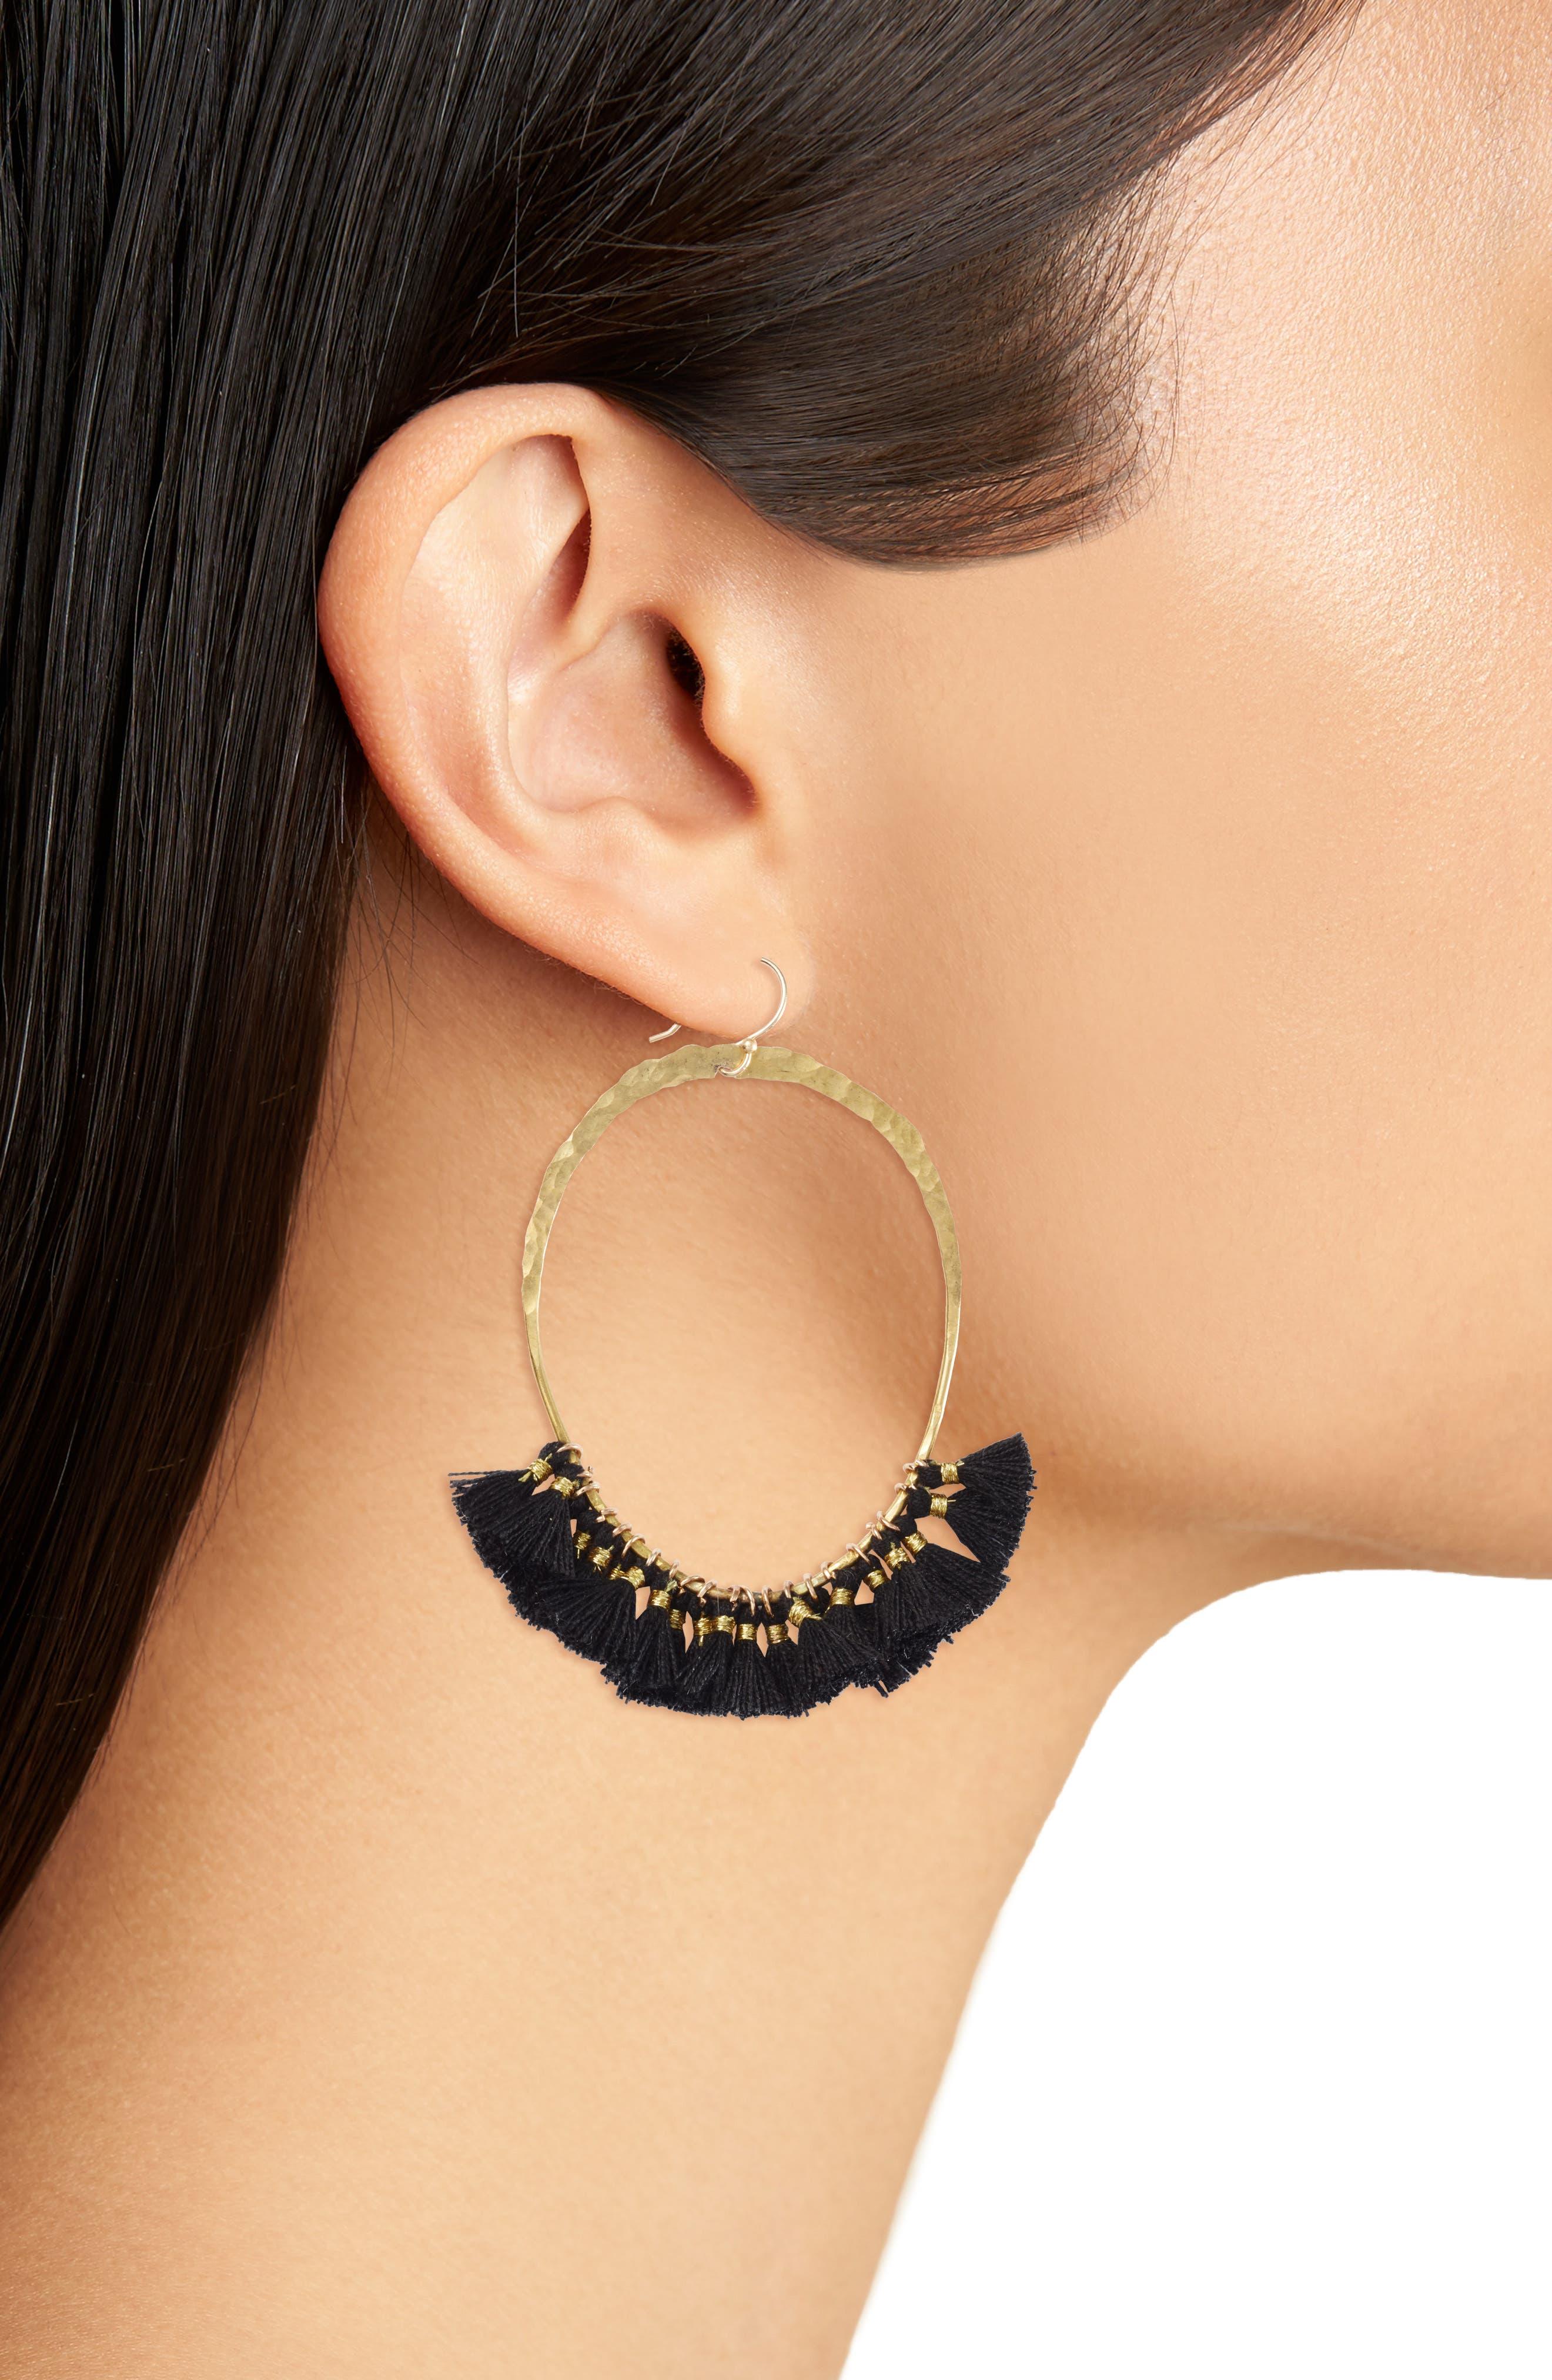 Tassel Hoop Earrings,                             Alternate thumbnail 2, color,                             GOLD/ BLACK